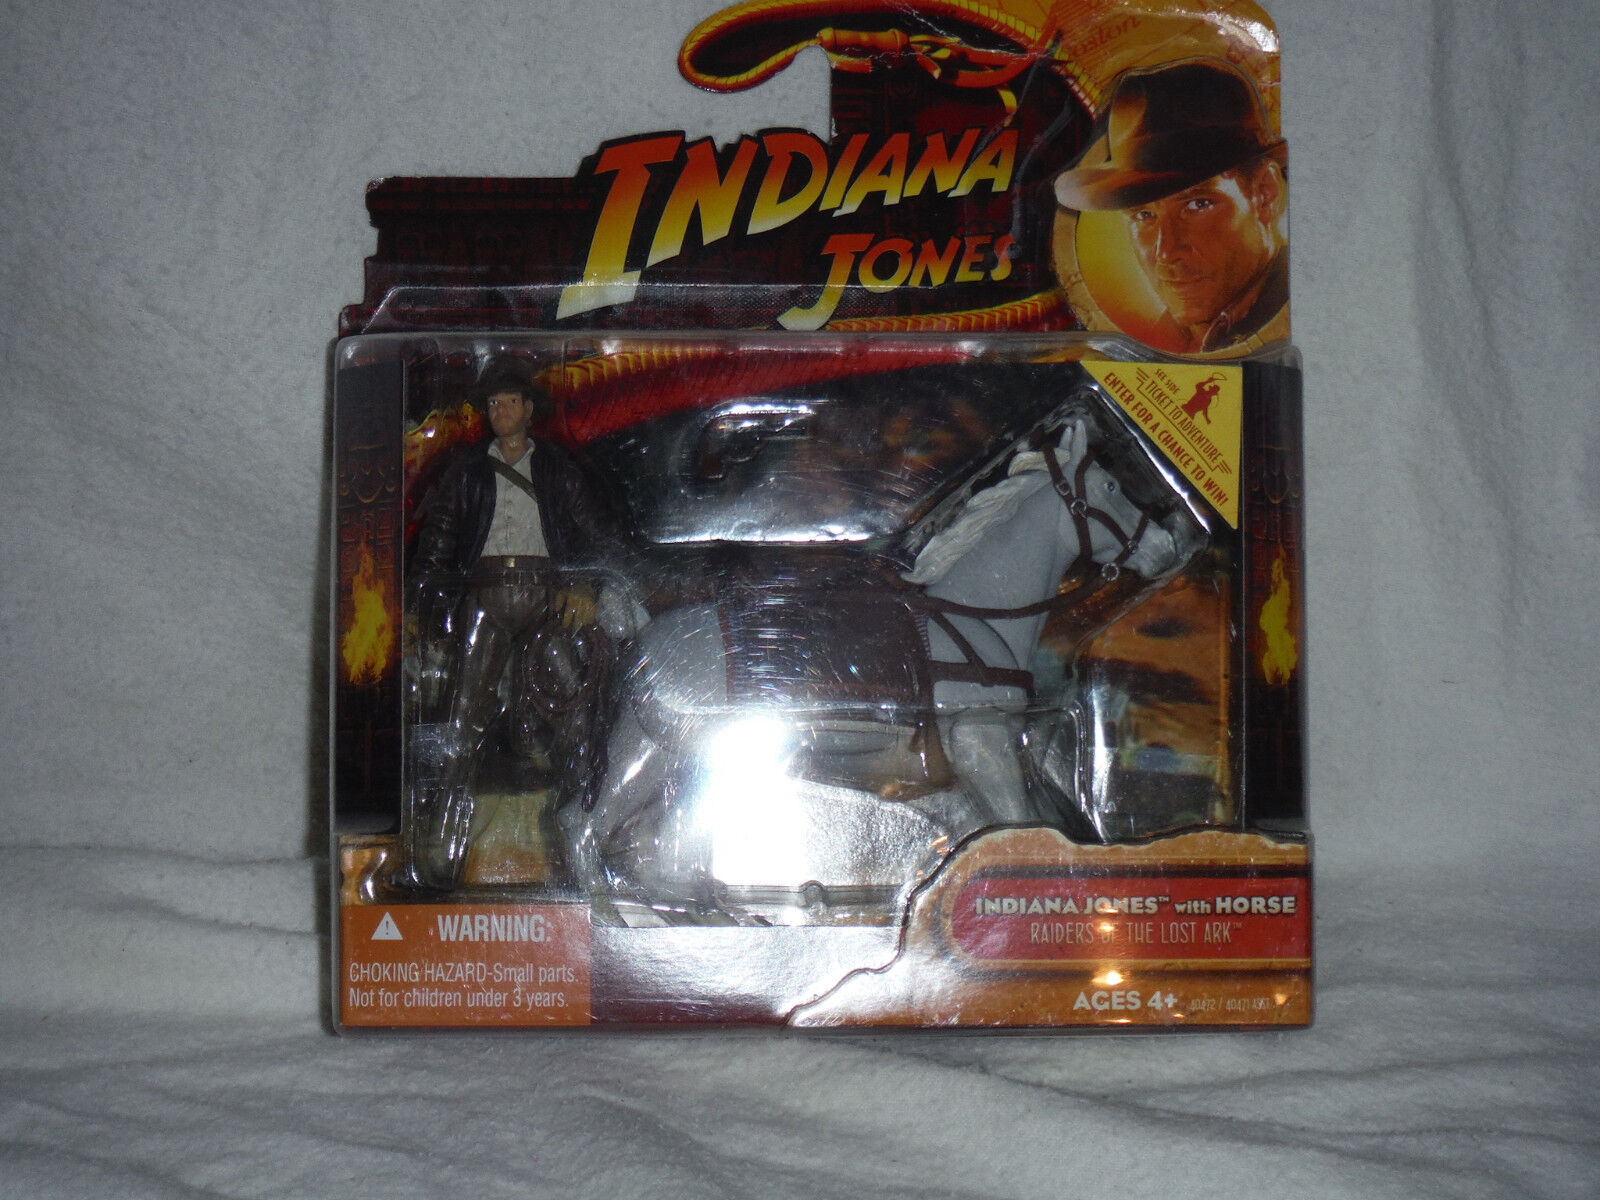 INDIANA JONES DELUXE FIGURE  INDIANA JONES WITH WITH WITH HORSE 82cc4c